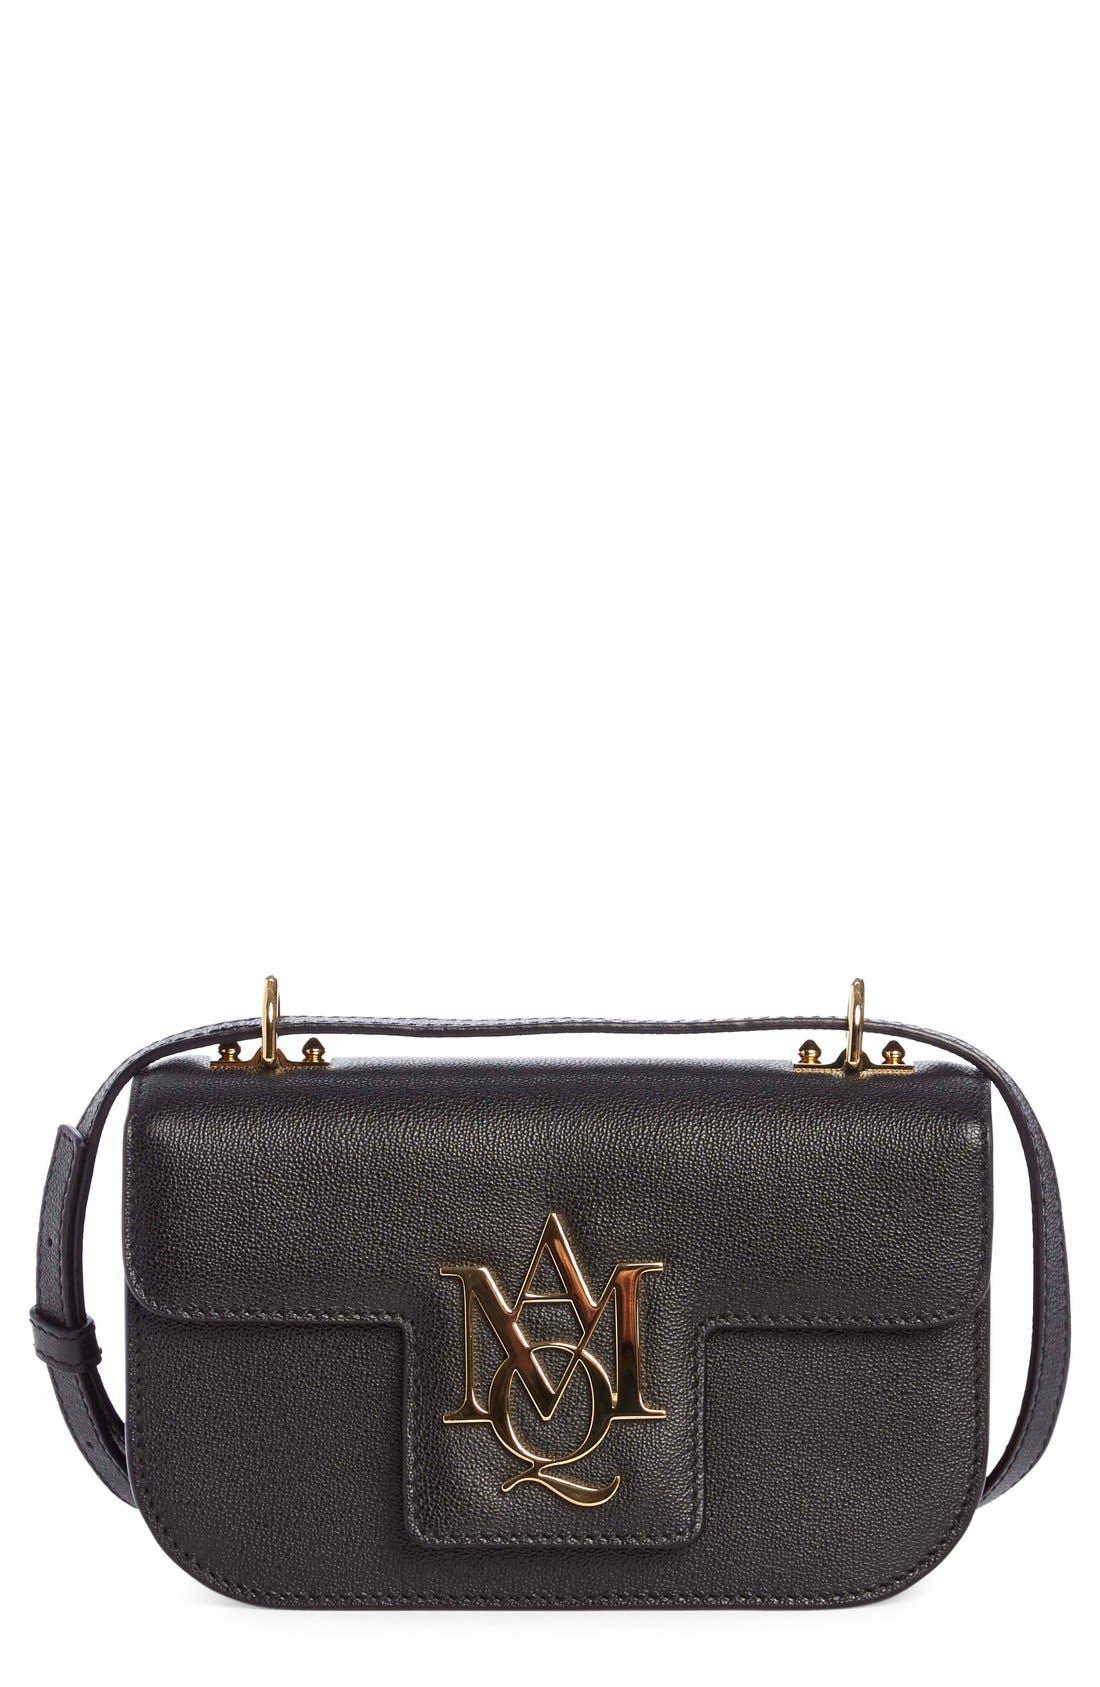 ALEXANDER MCQUEEN 'Small Insignia' Calfskin Leather Crossbody Satchel, Main, color, 001